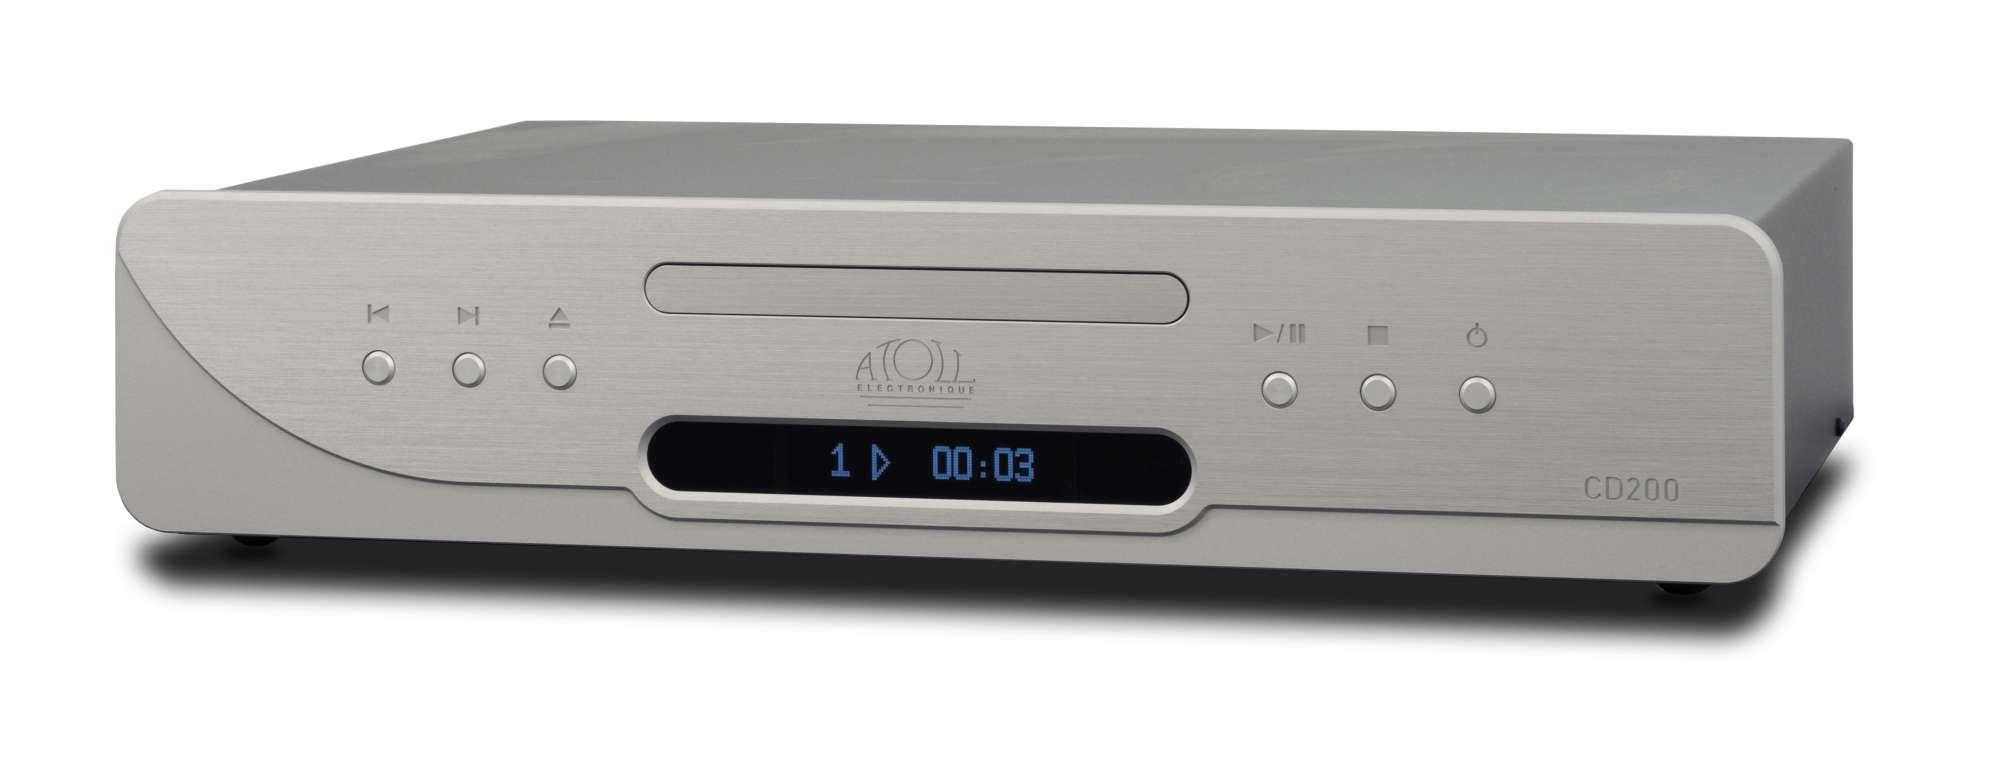 Atoll CD 200 Signature CD-Player